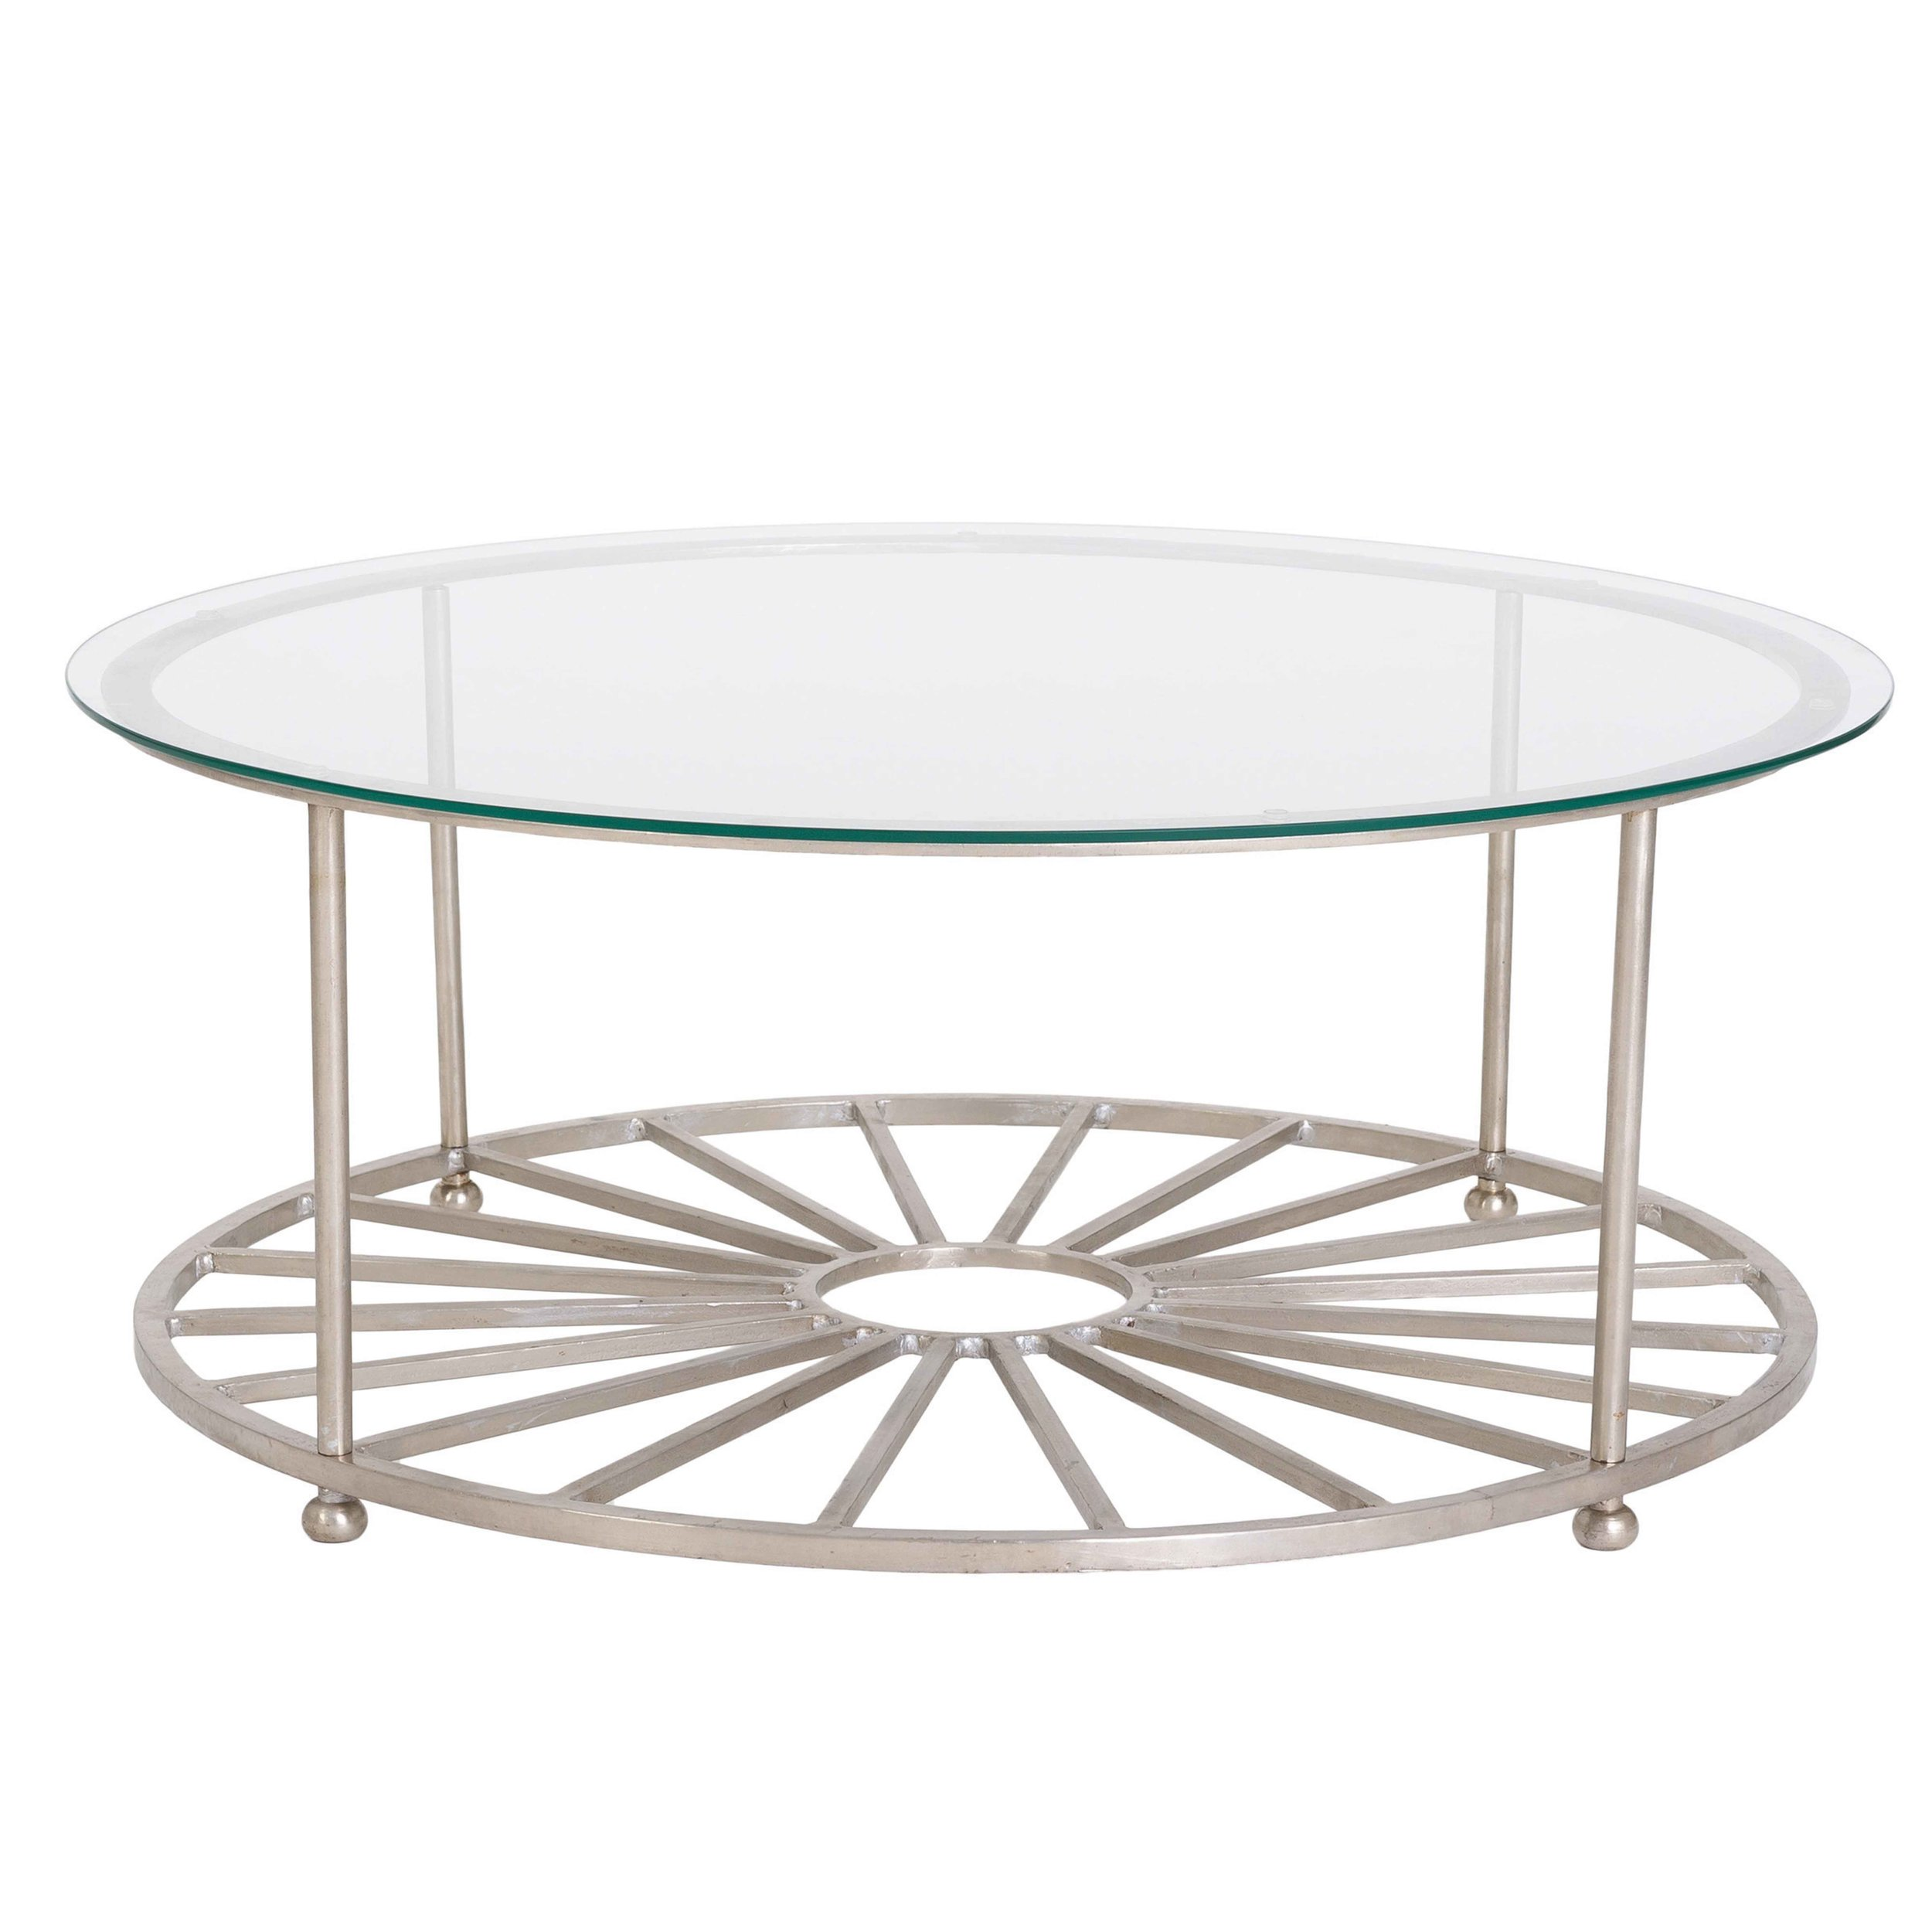 Casper Coffee Table_lowres.jpg